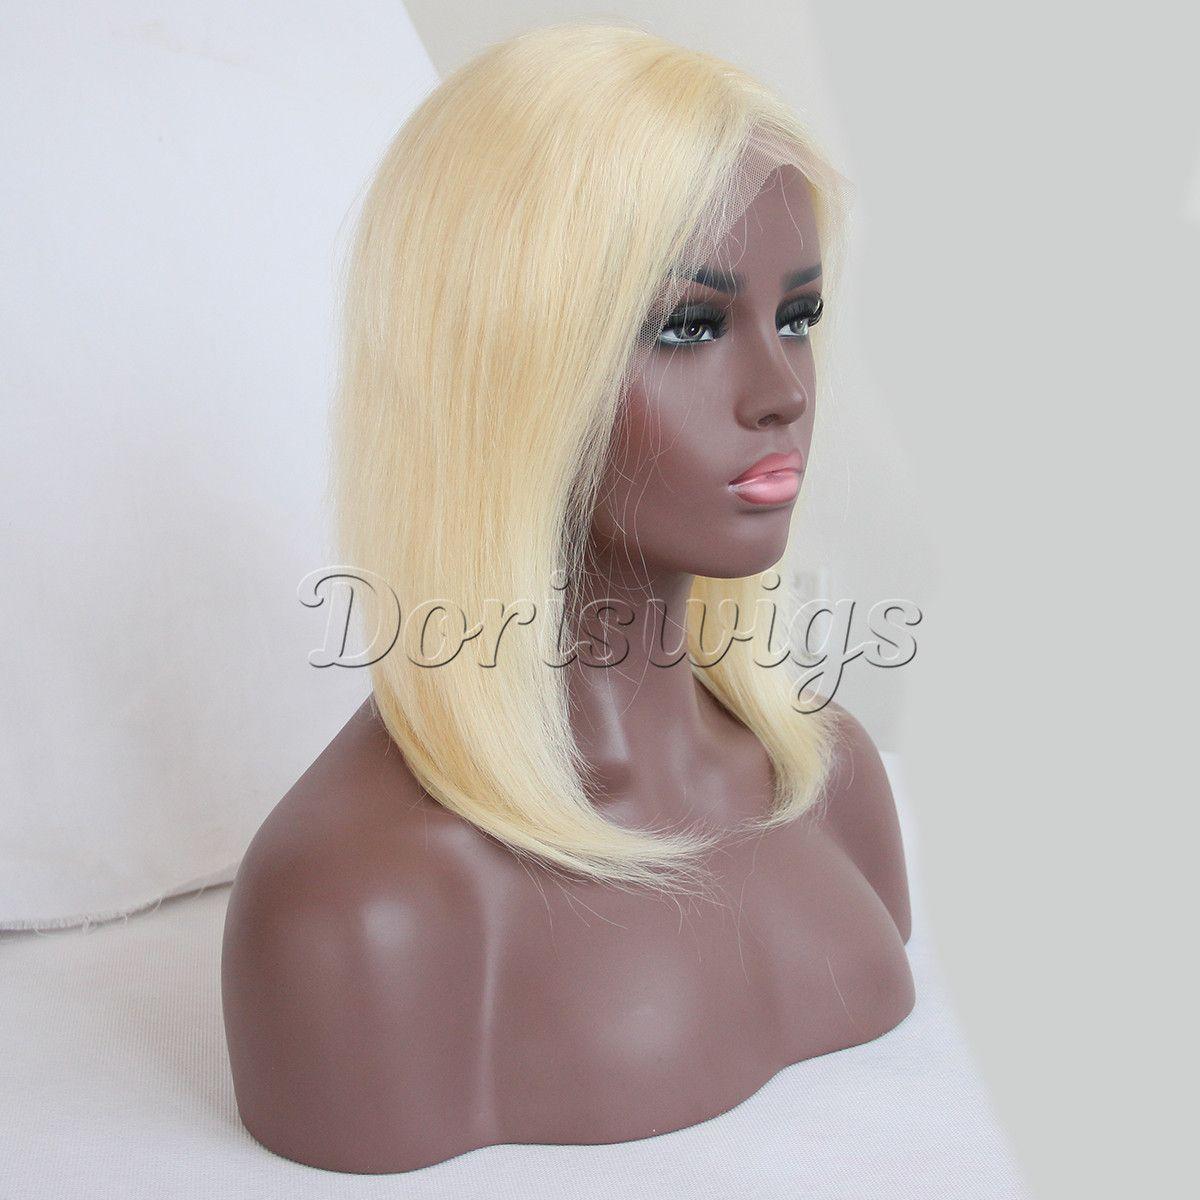 Blonde Bob Lace Front Wig Brazilian Silky Straight Short bob Human Hair Wig for Black Women 130 Density Pre-Plucked.